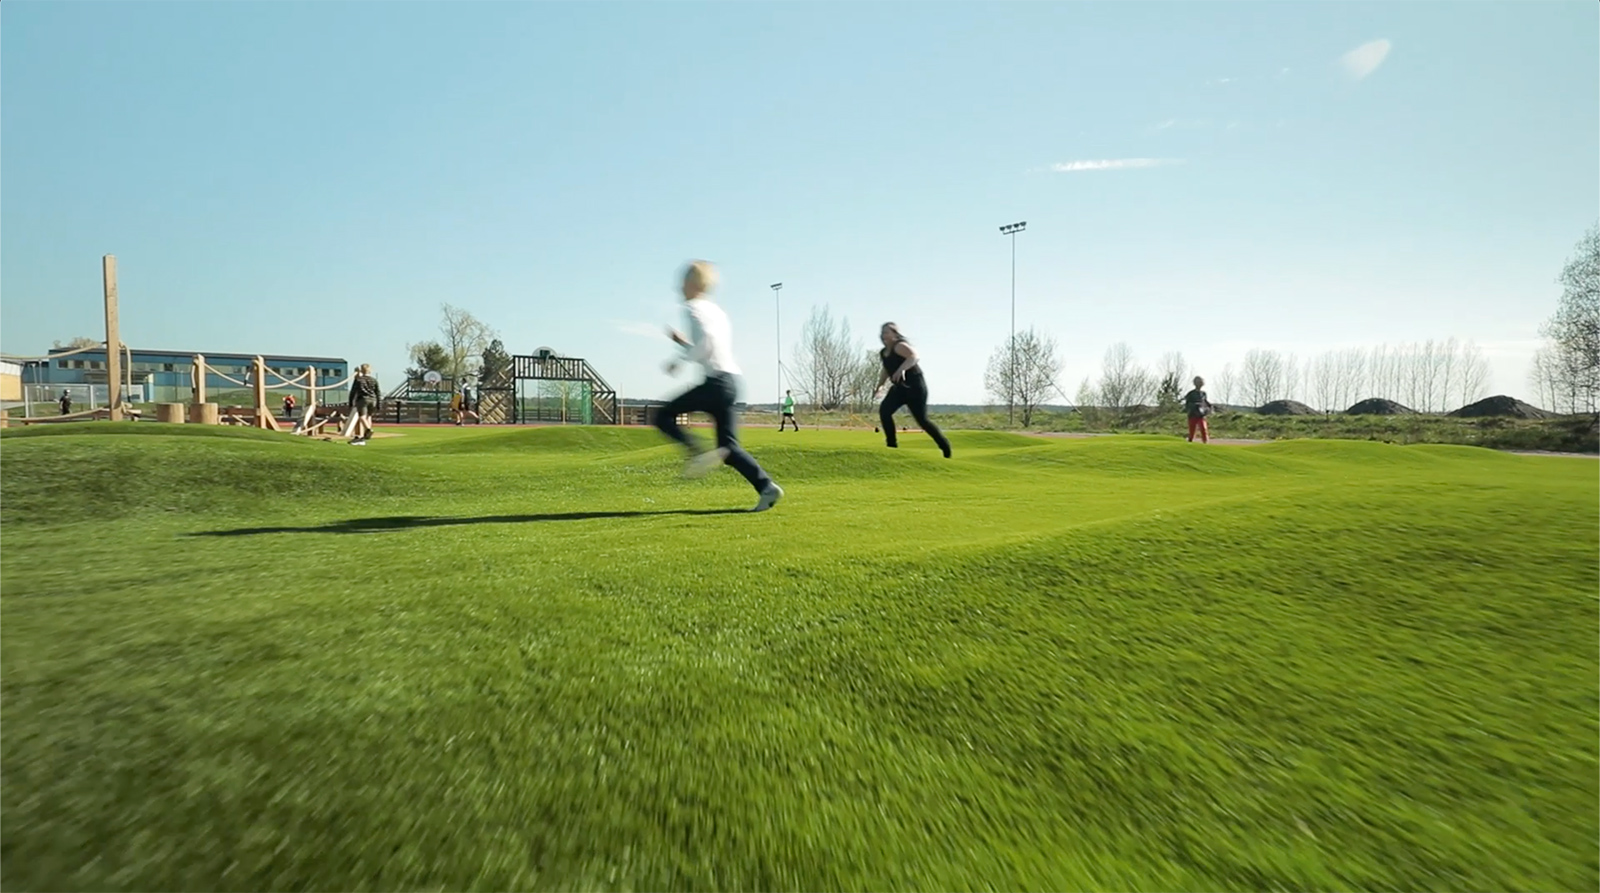 unisport aktivitetspark valla